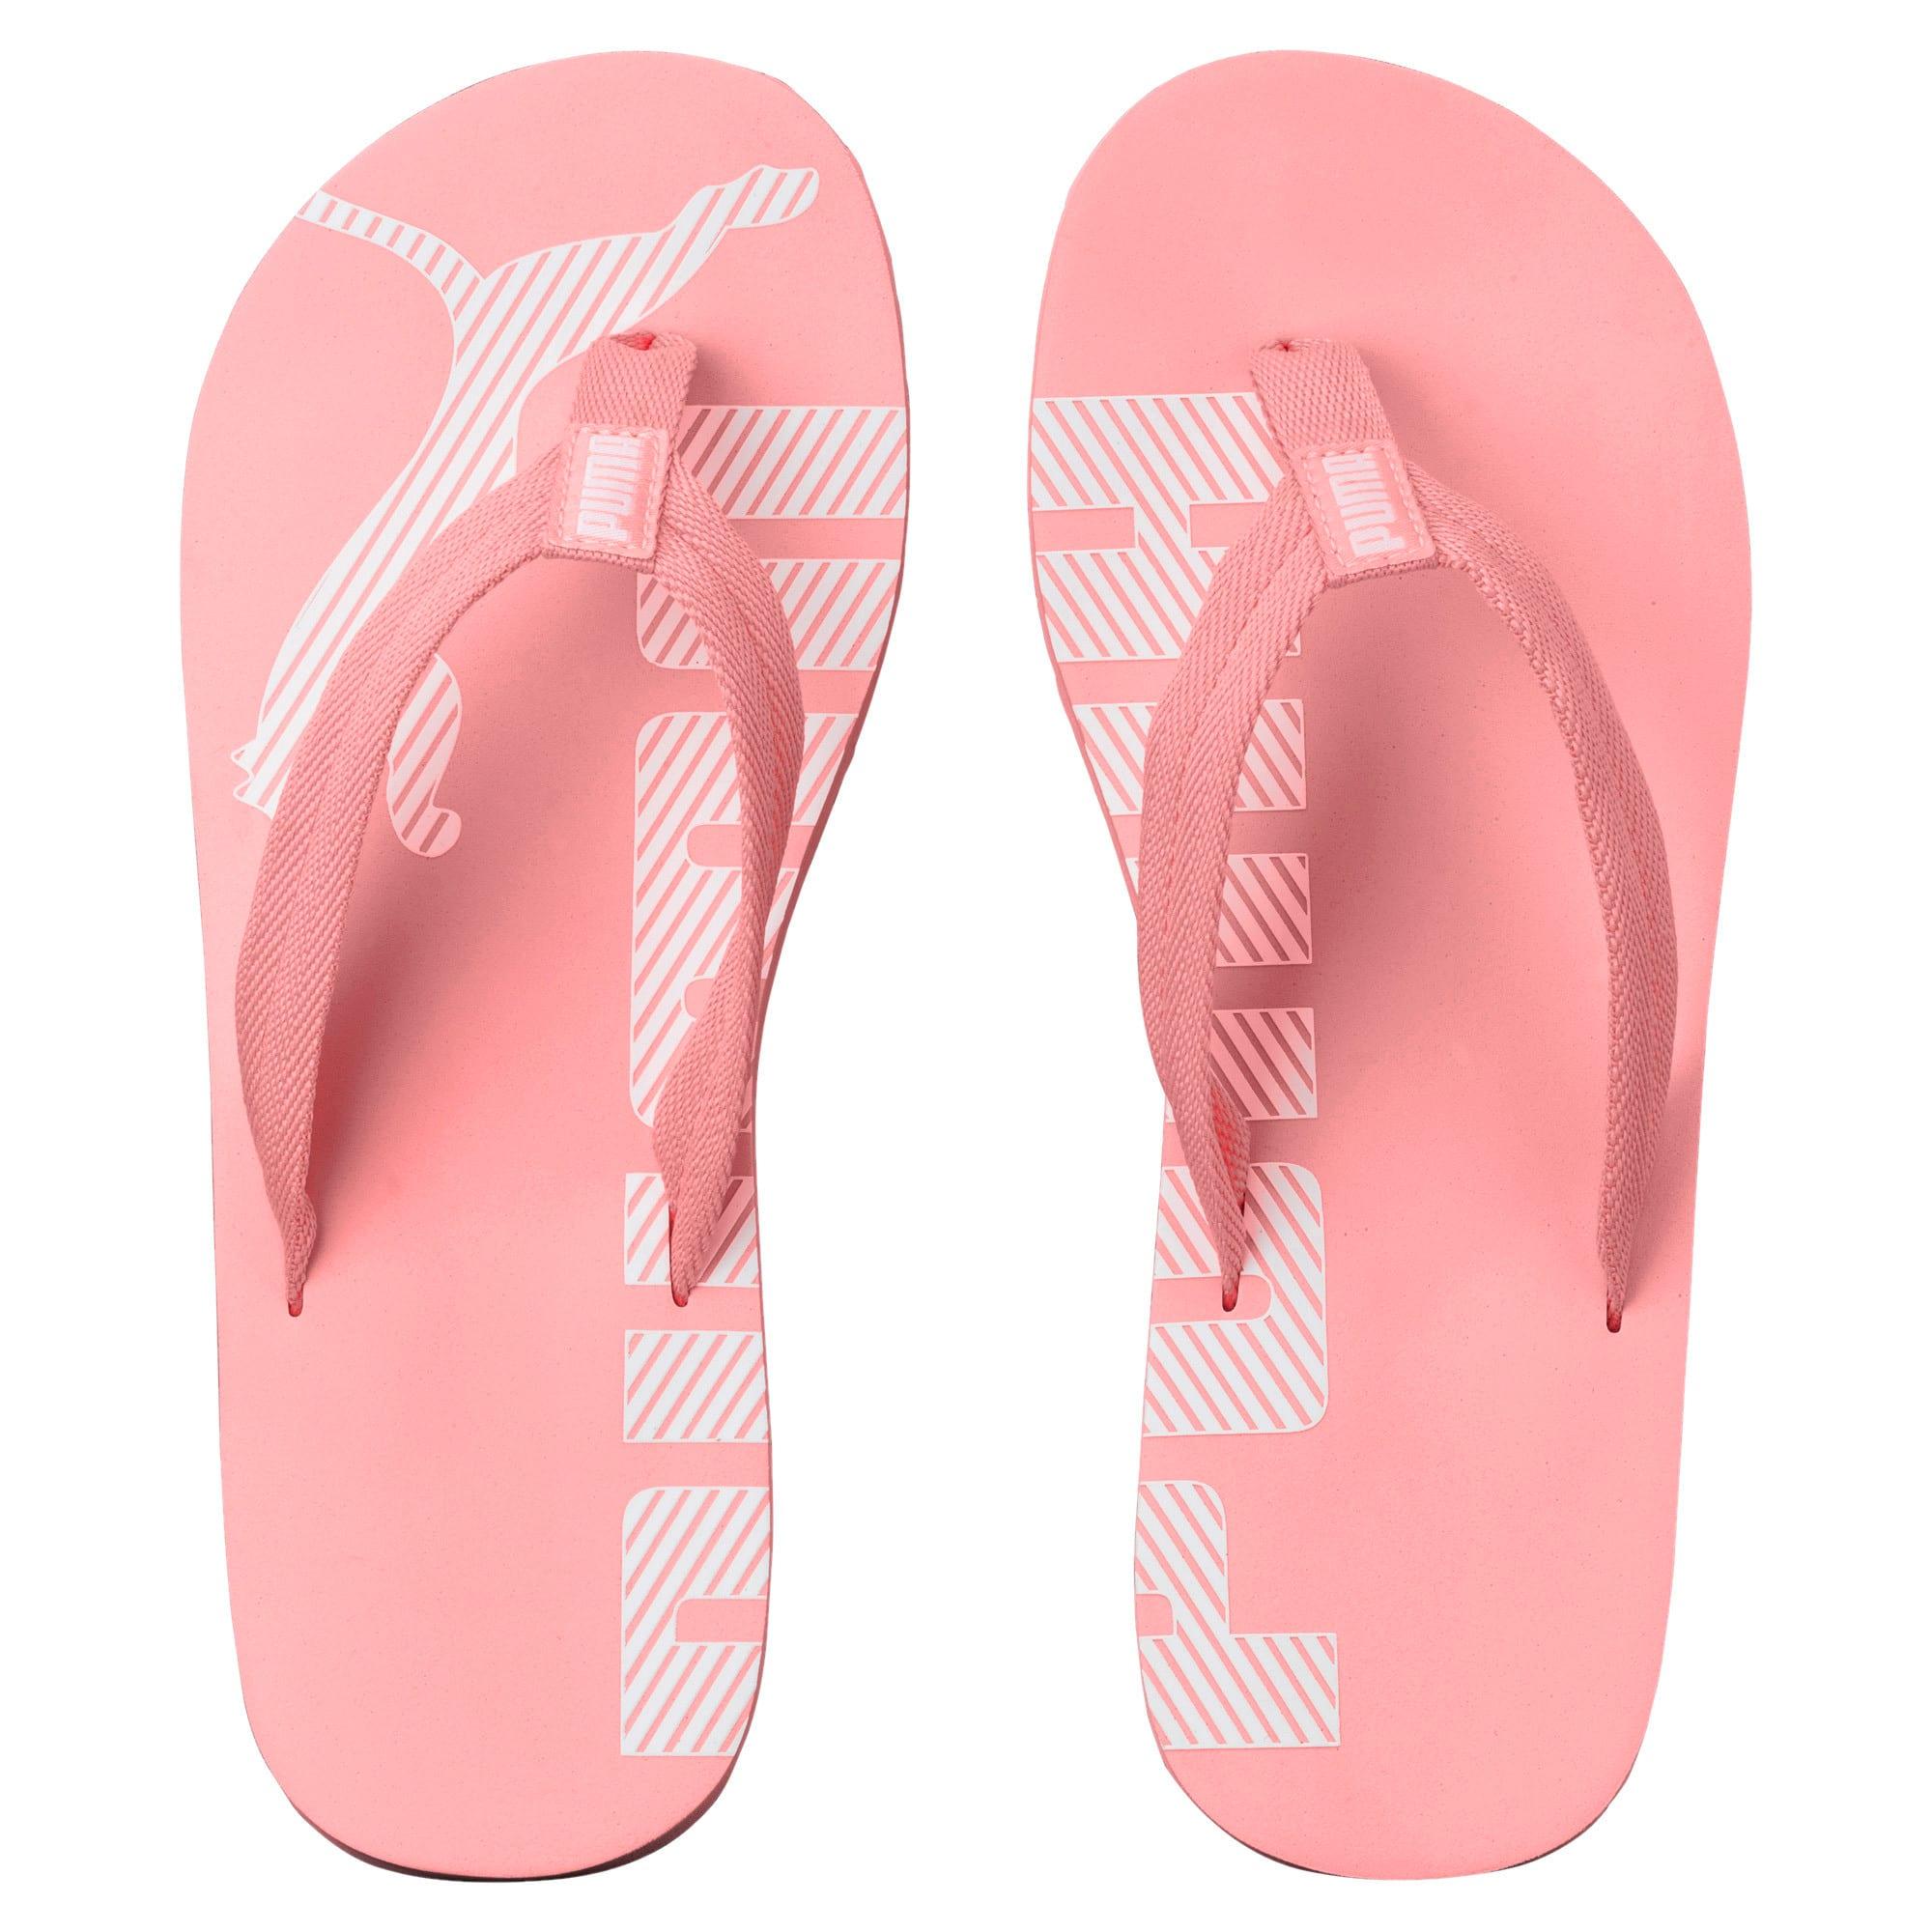 Thumbnail 5 of Epic Flip v2 Sandals, Soft Fluo Peach-Puma White, medium